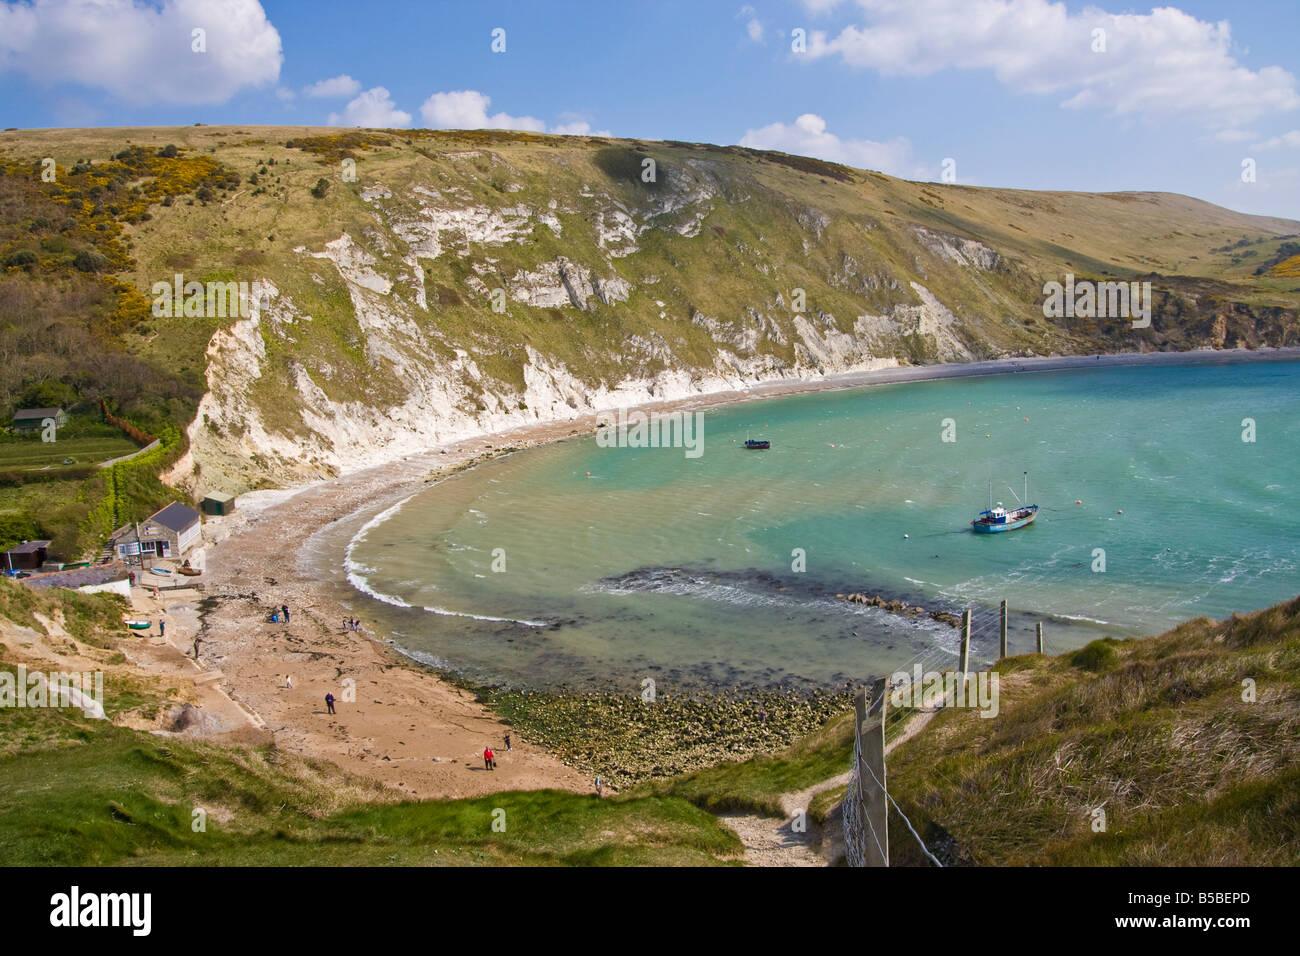 Lulworth Cove, Dorset, England, Europe - Stock Image